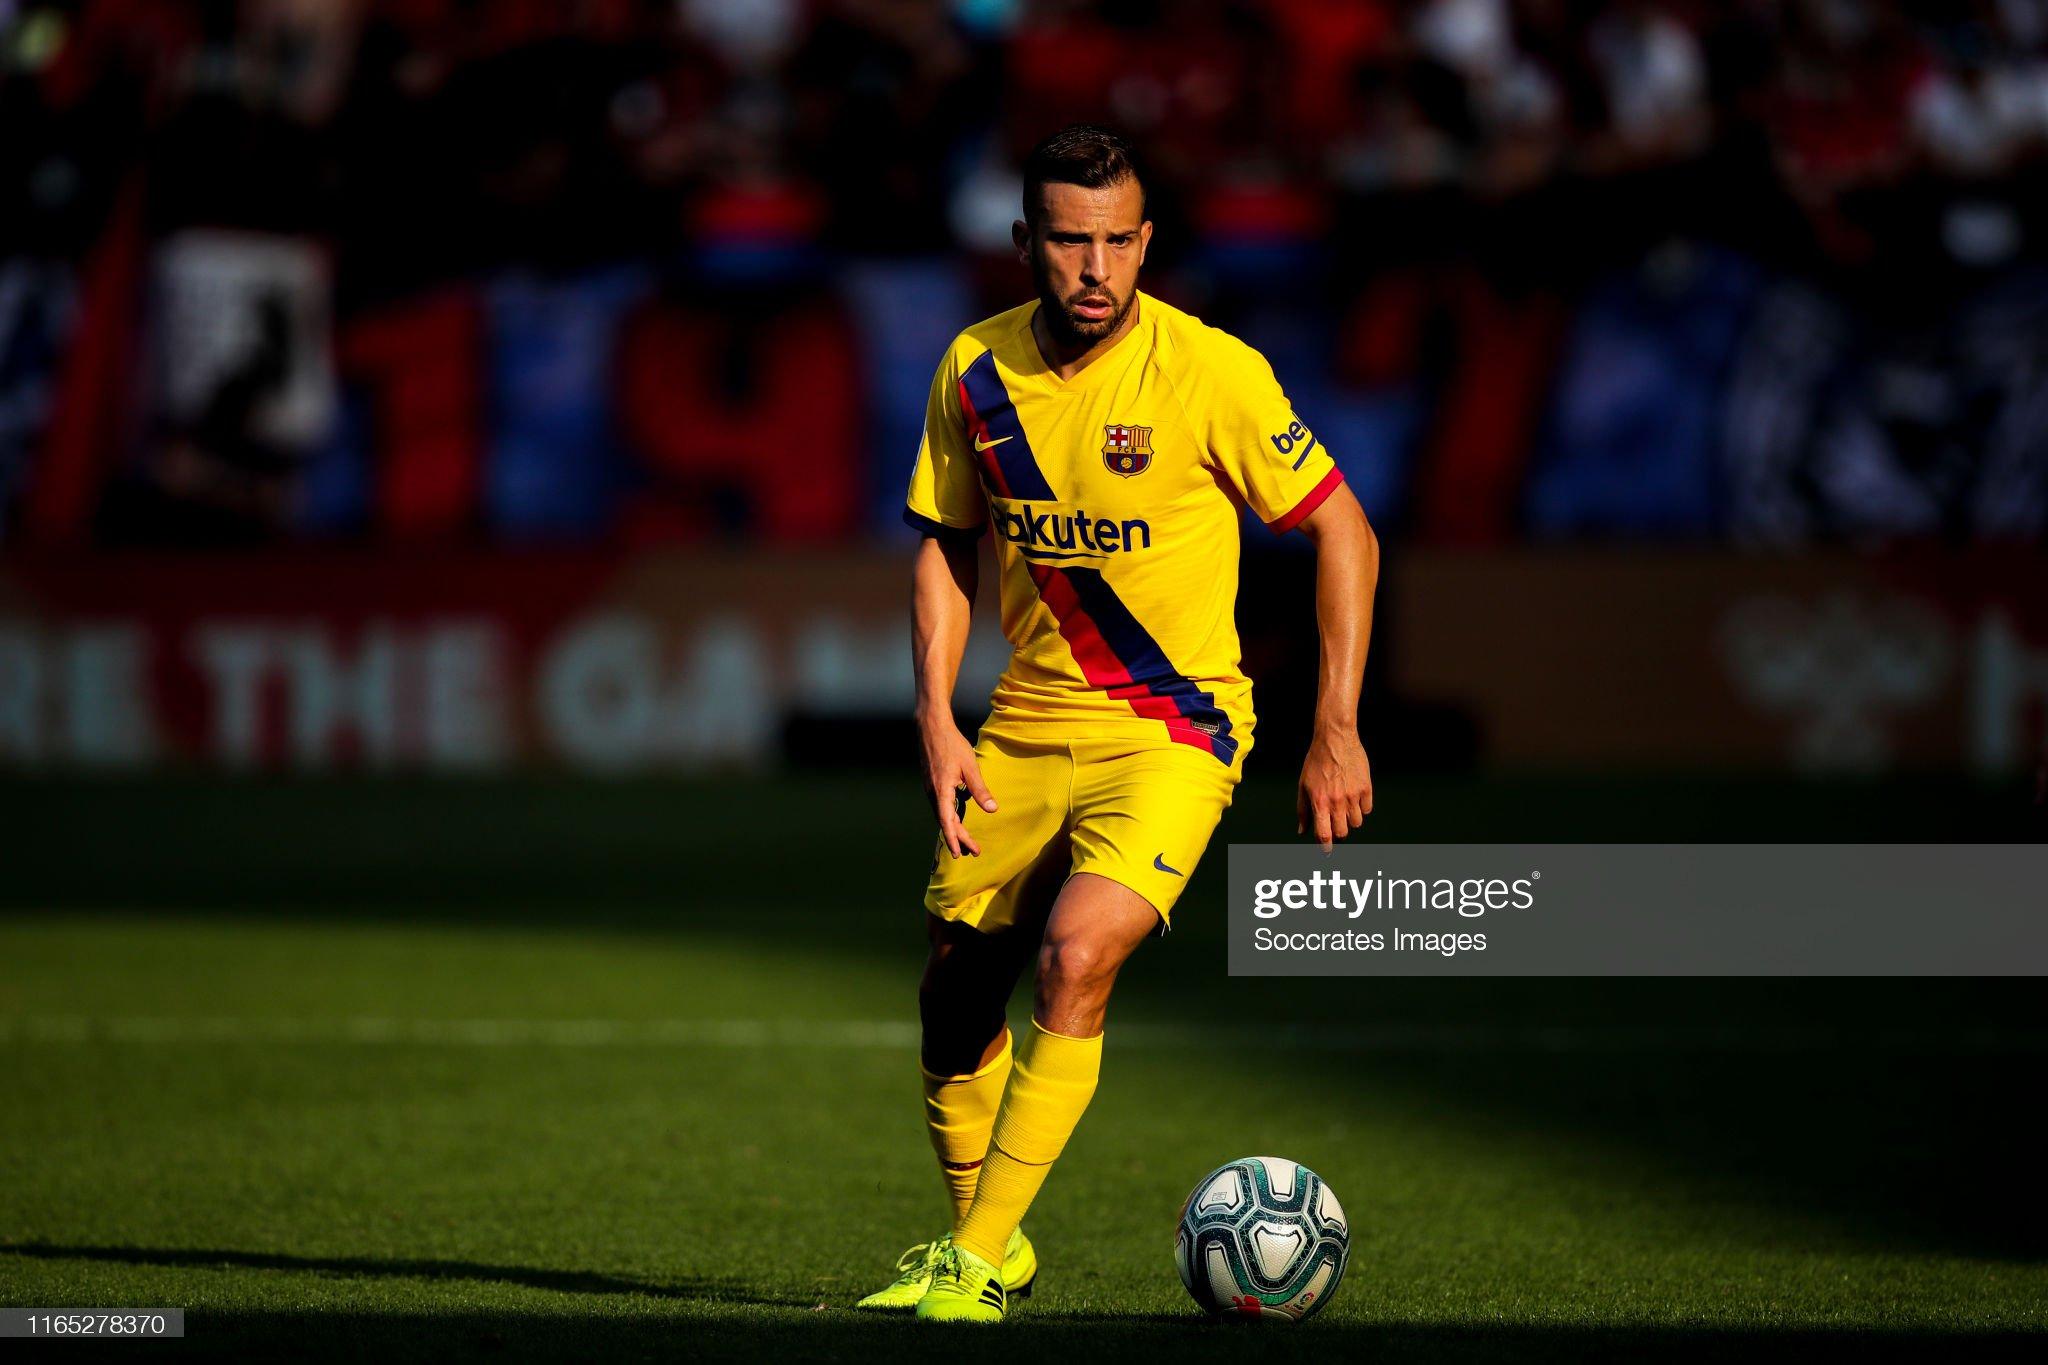 صور مباراة : أوساسونا - برشلونة 2-2 ( 31-08-2019 )  Jordi-alba-of-fc-barcelona-during-the-la-liga-santander-match-between-picture-id1165278370?s=2048x2048